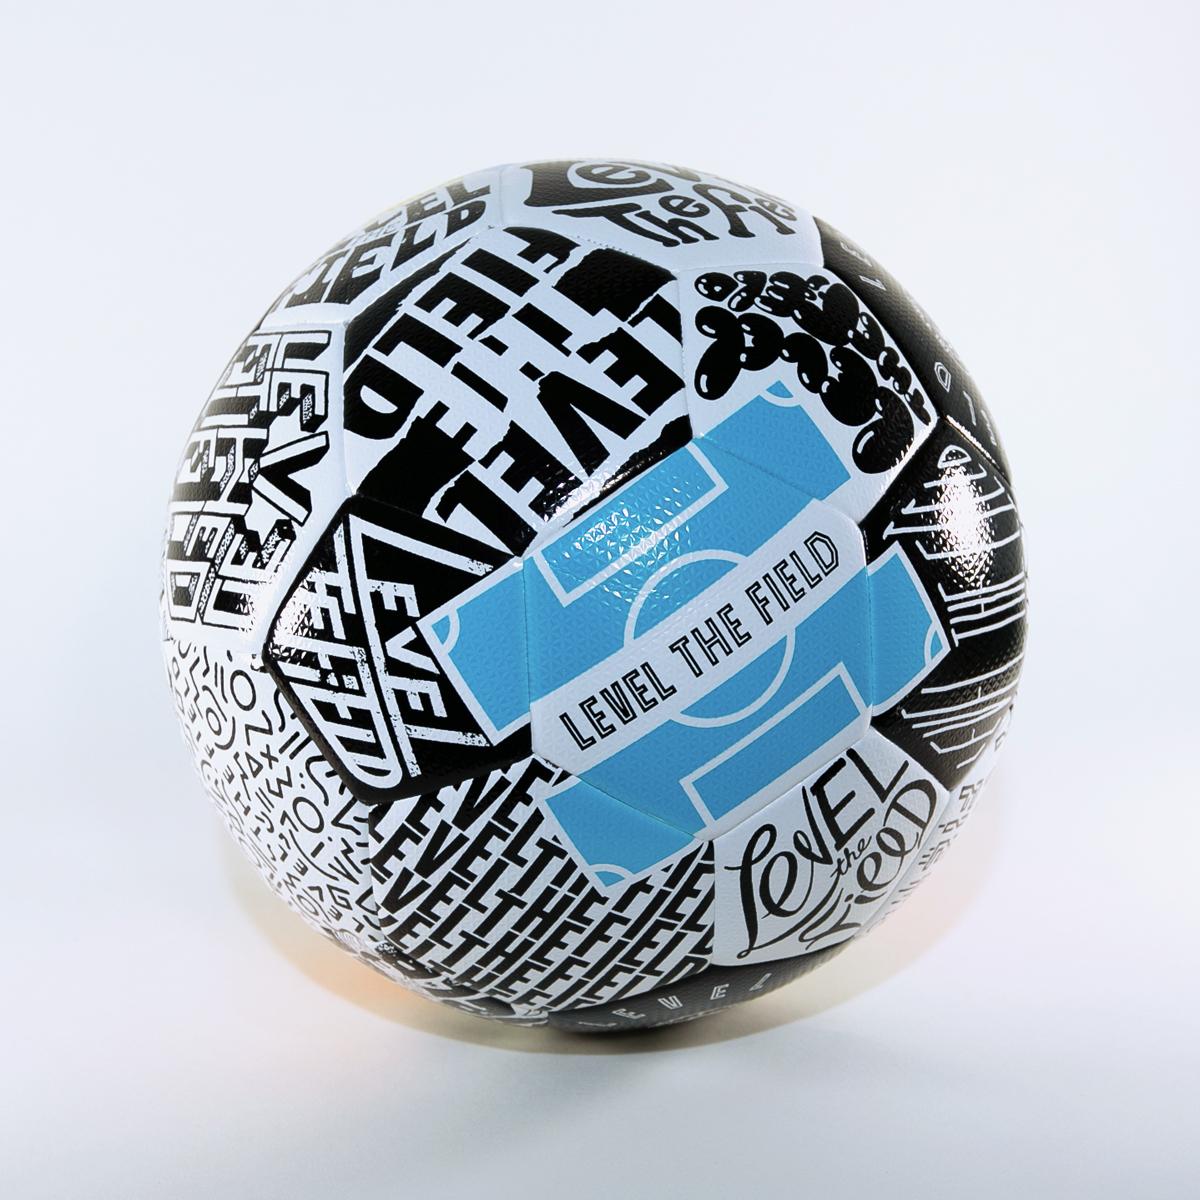 Charity Ball Selman Design Level The Field Soccer Ball